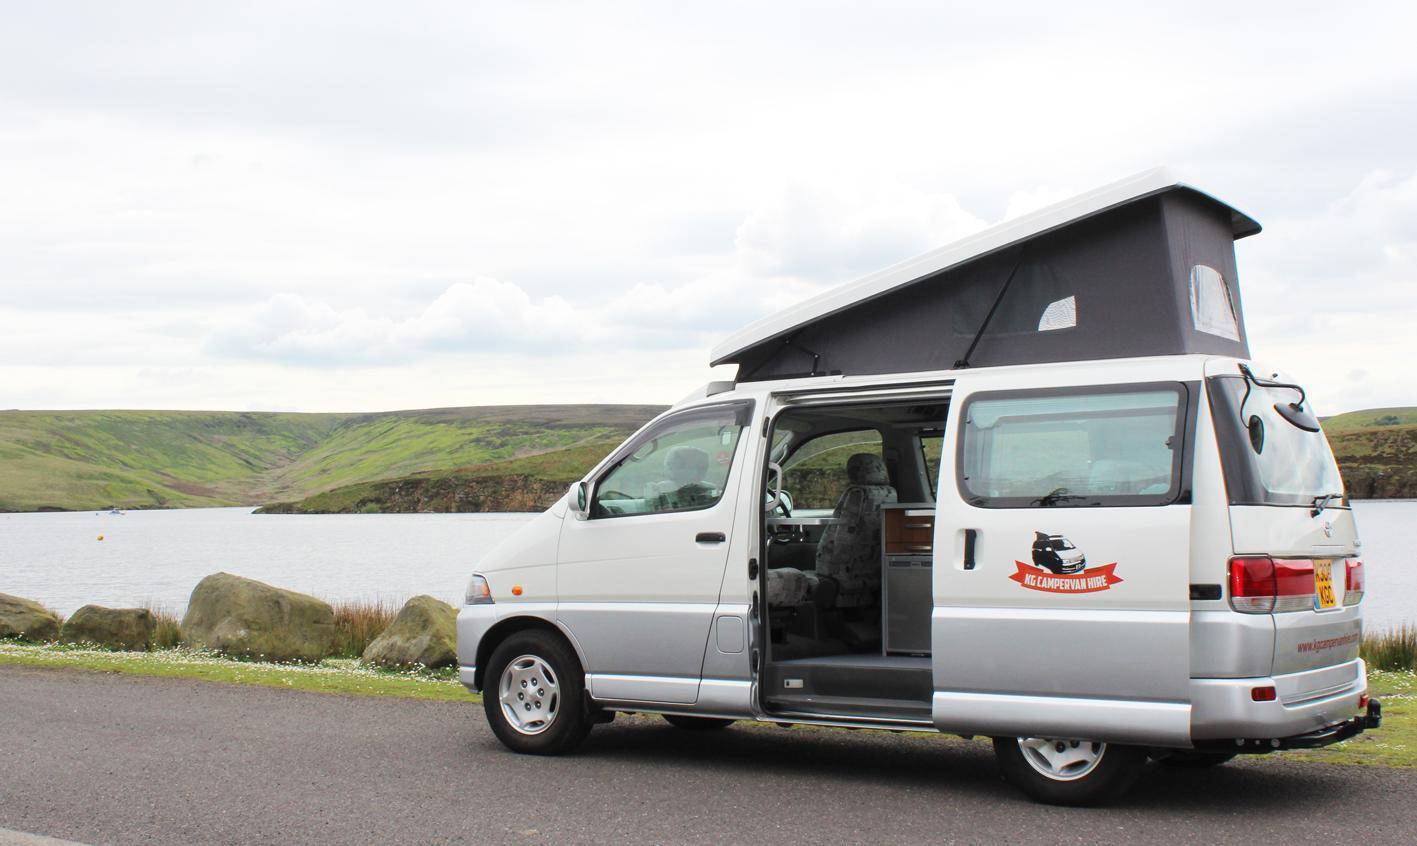 Campervan Hire in the Peak District National Park